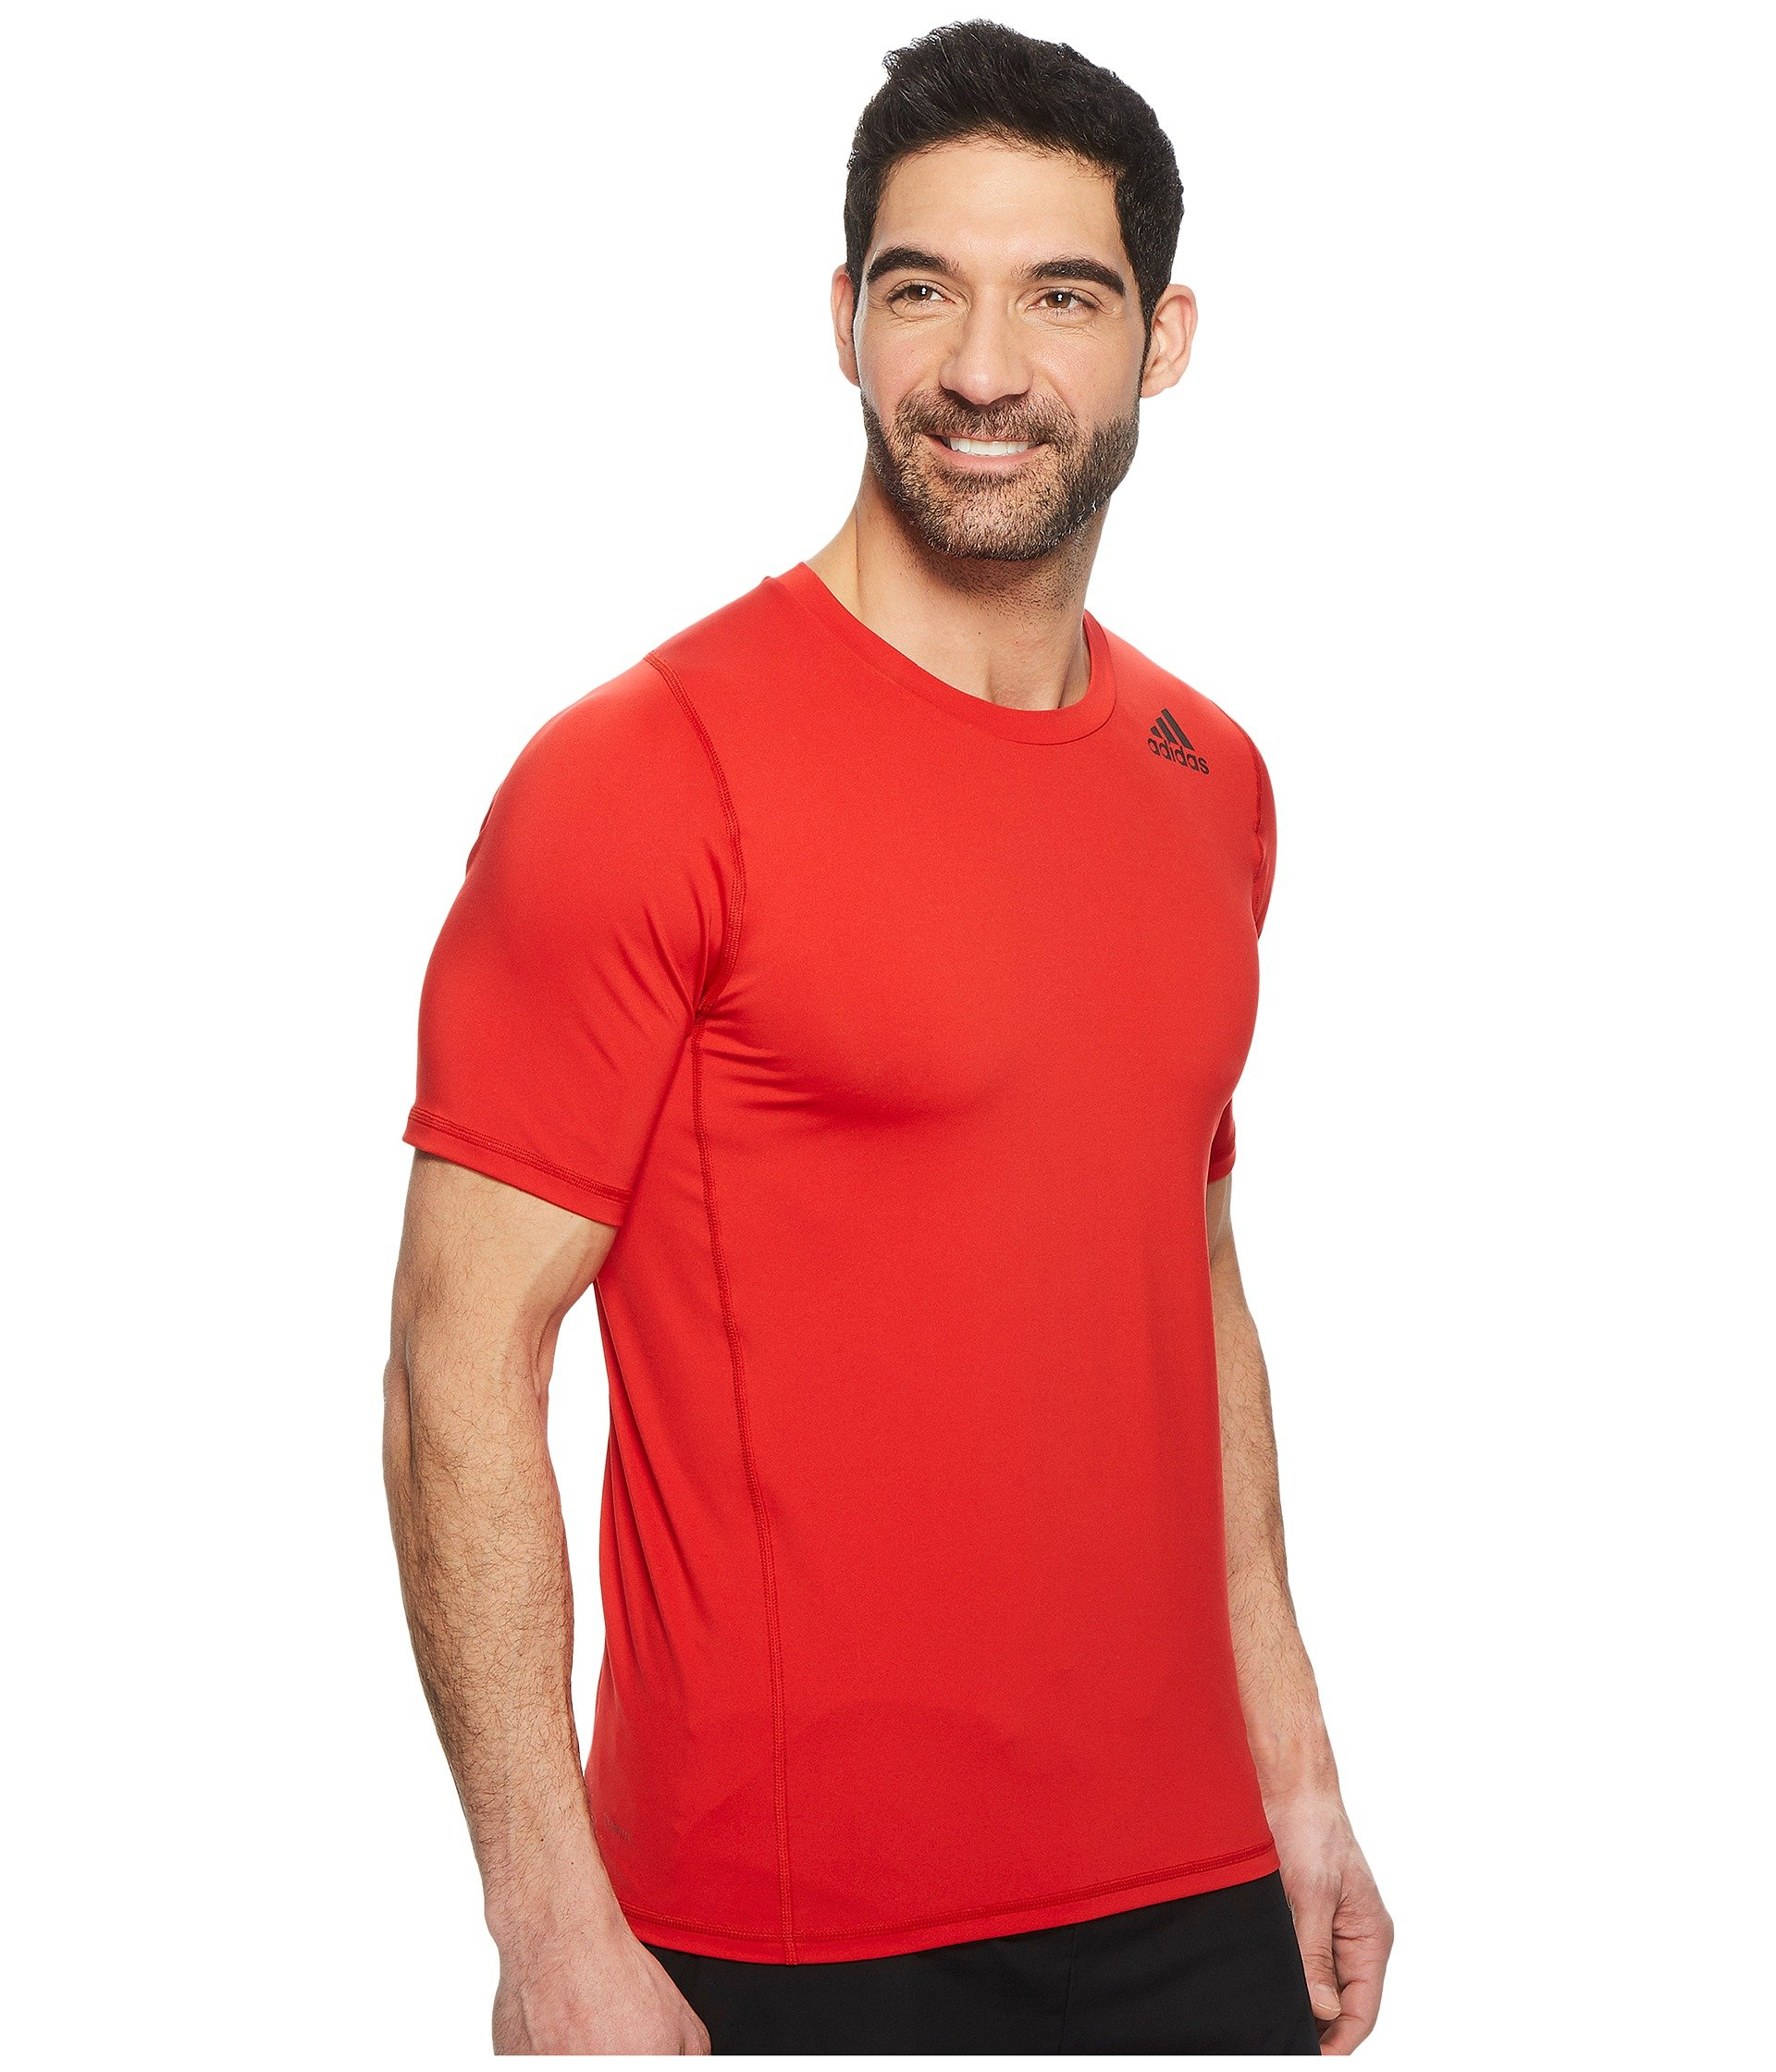 Sport Scarlet Tee Fitted Adidas Alphaskin Short Sleeve YxR5wq